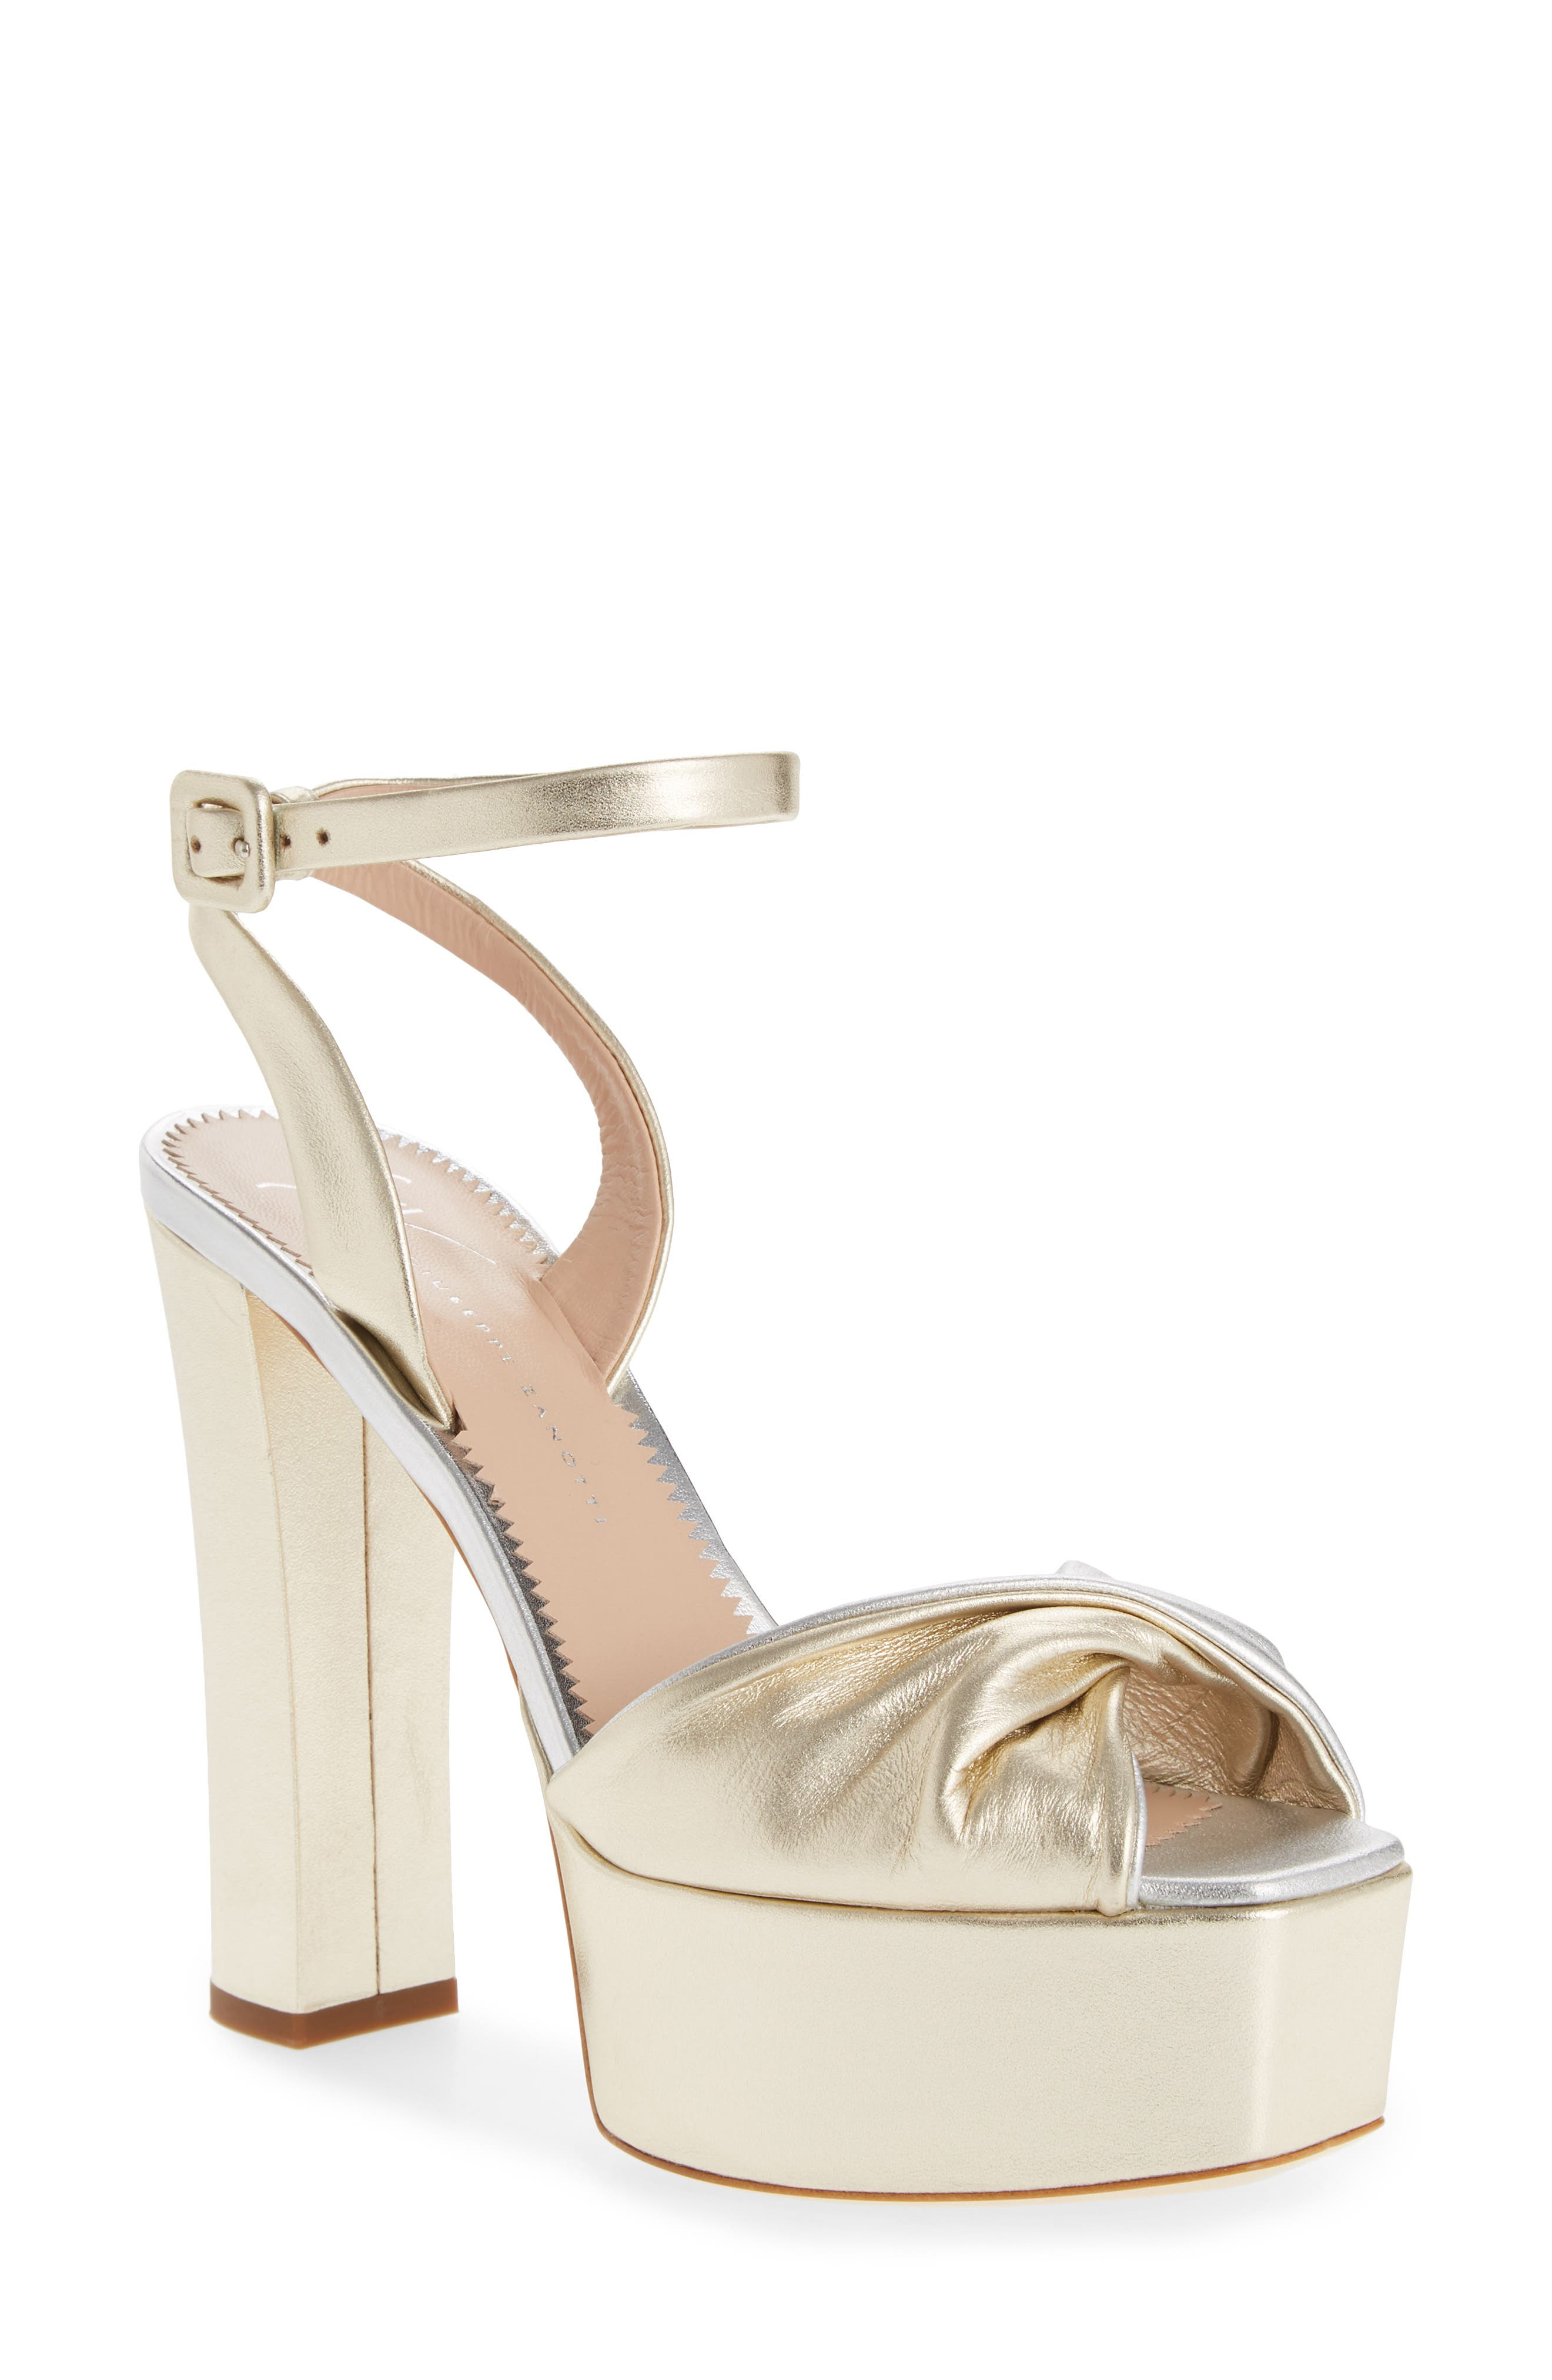 64861f10fa10 Giuseppe Zanotti Women s Metallic Shoes  Sneakers   Sandals